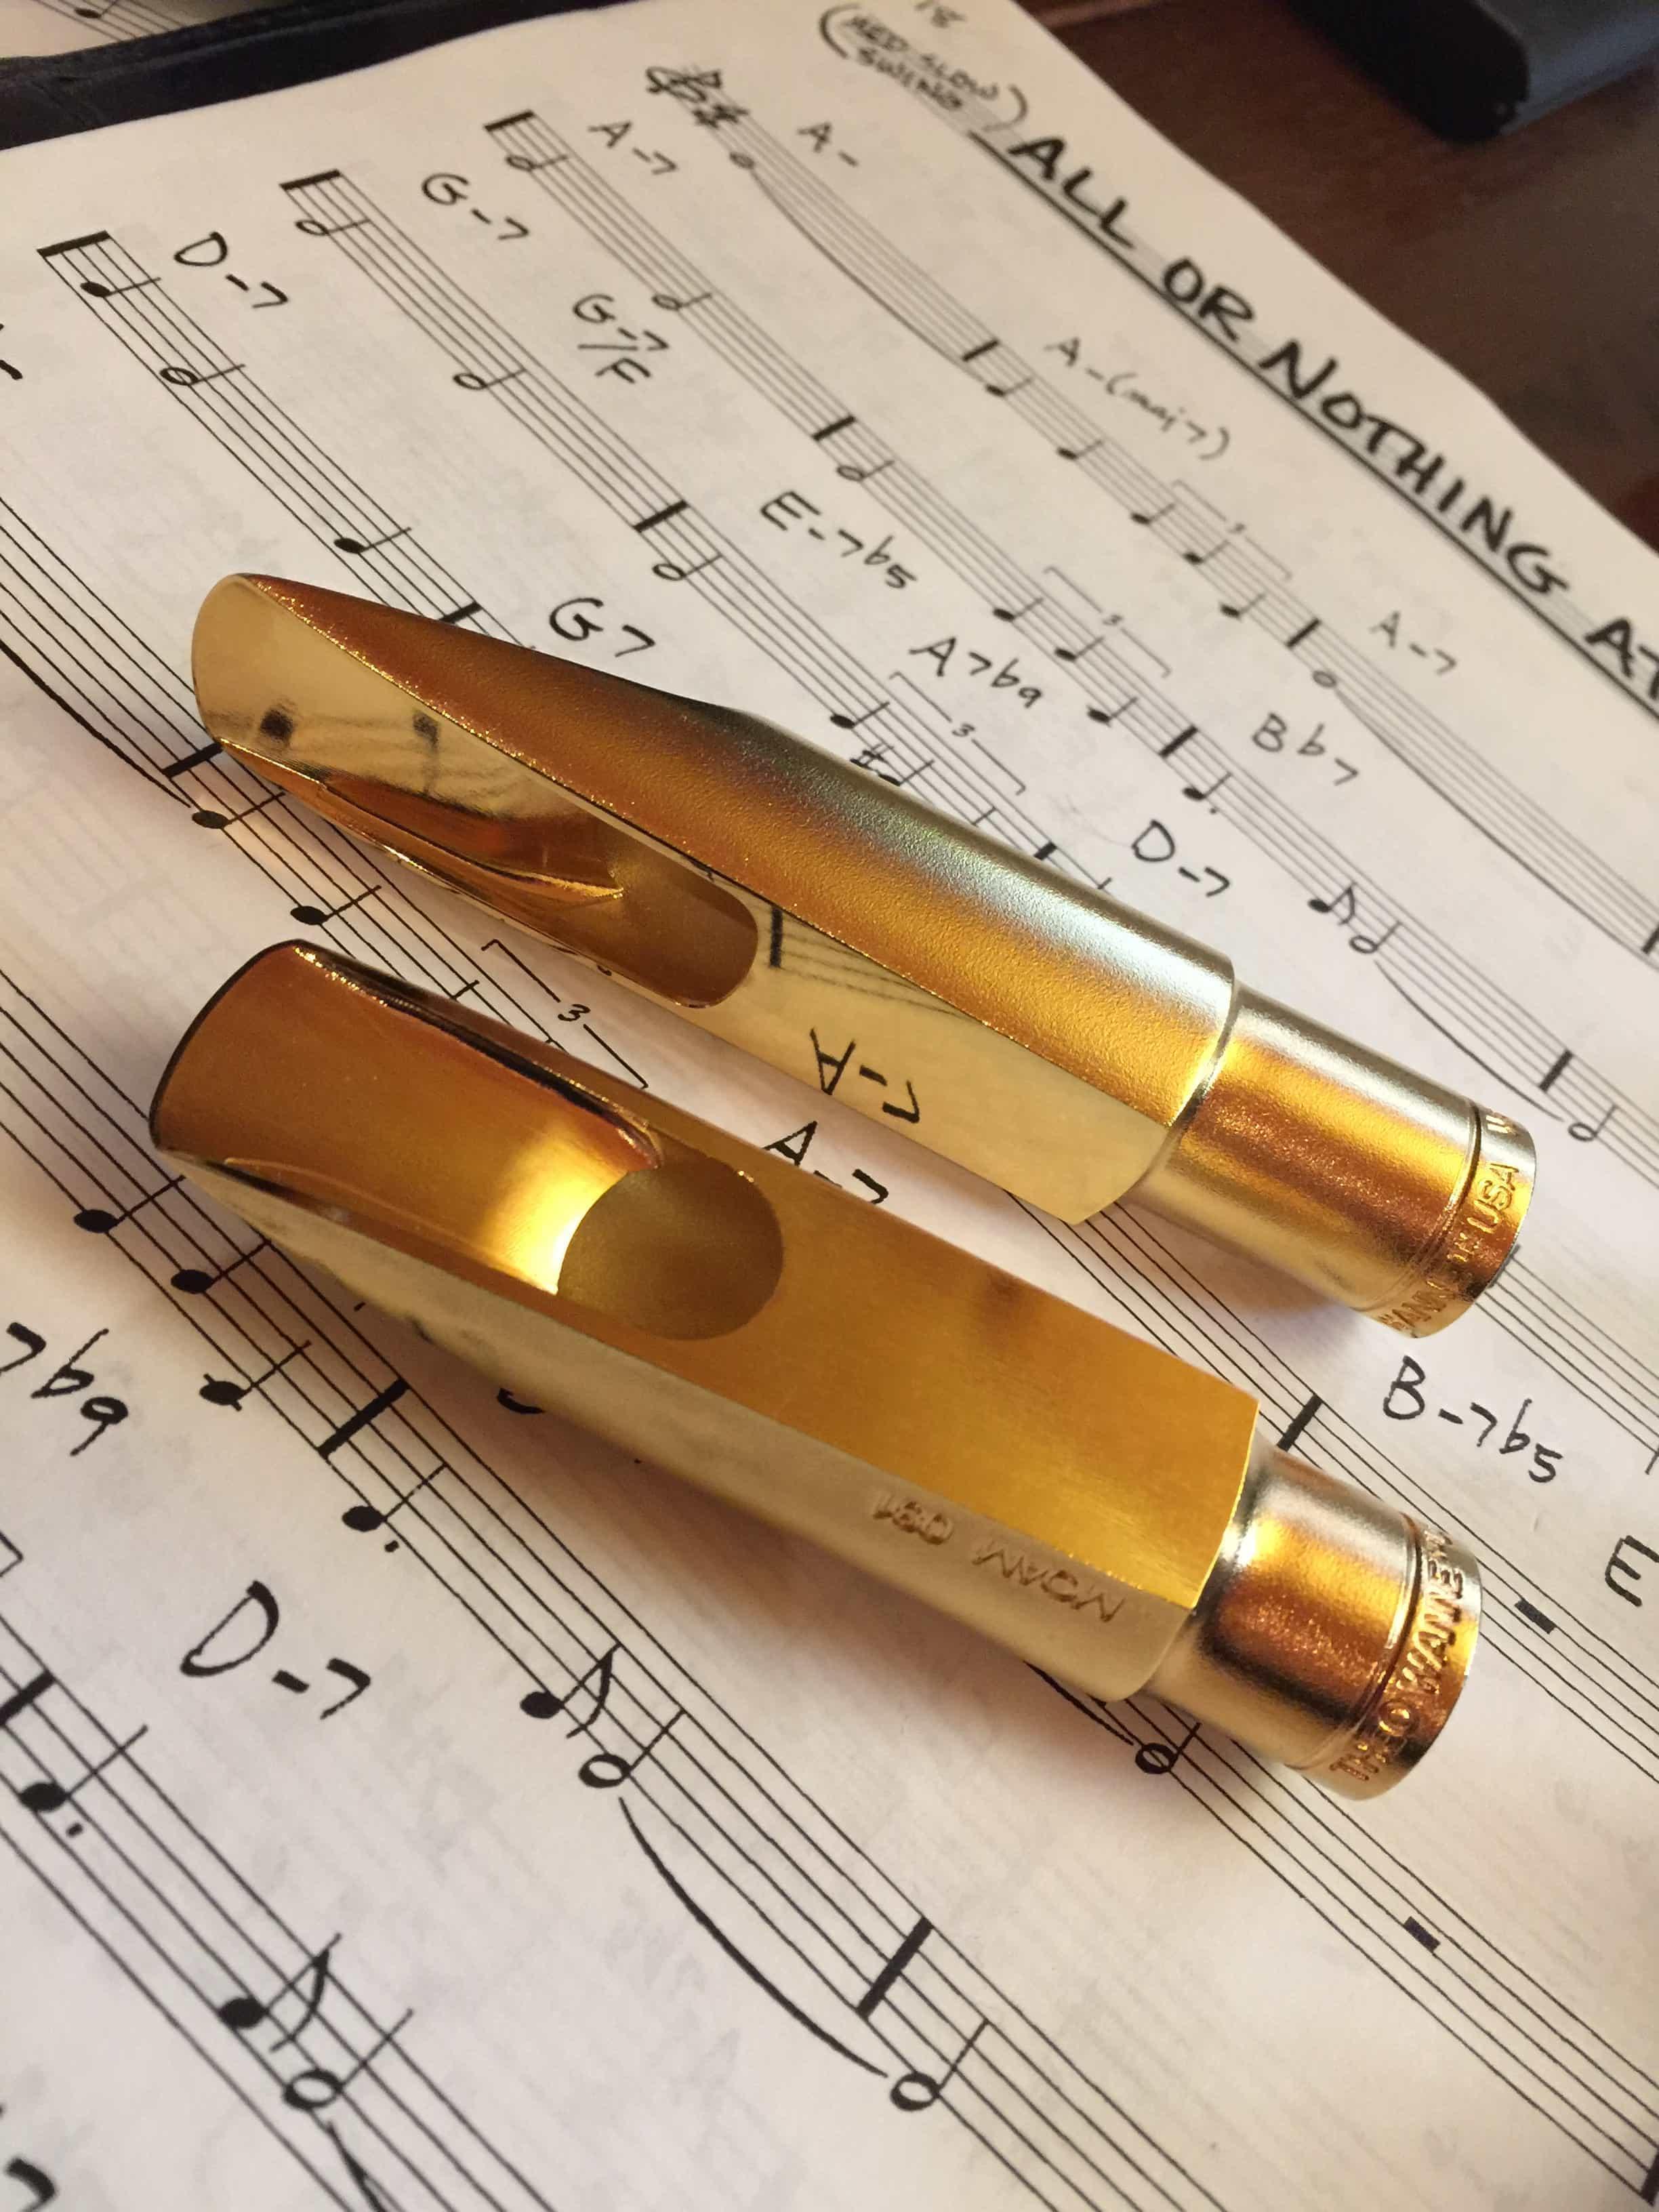 Westcoast Sax MOAM  081 Alto Saxophone Mouthpiece Review